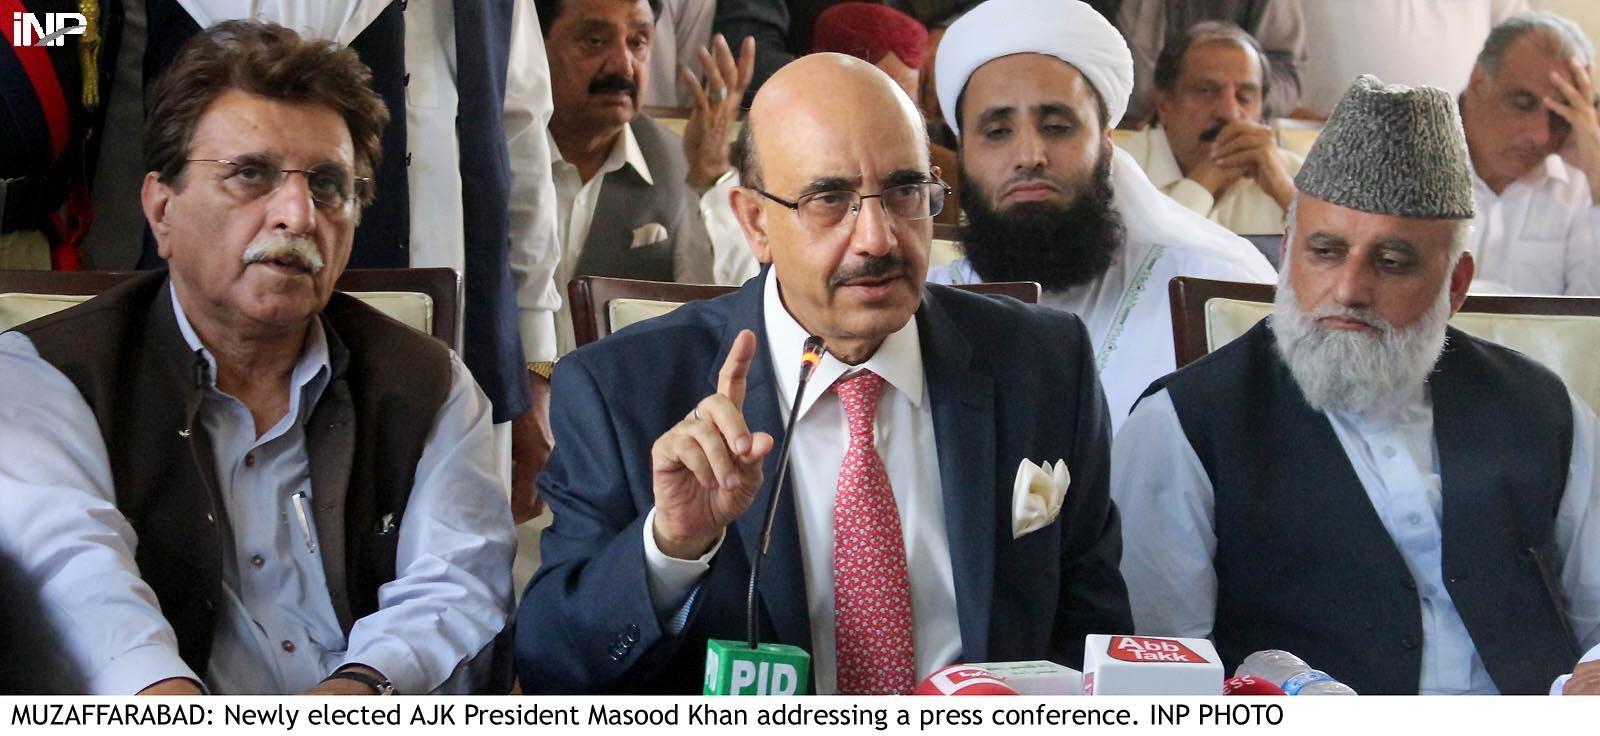 ajk prime minister appoints fida hussain kiyani as director general jammu and kashmir liberation cell photo inp file